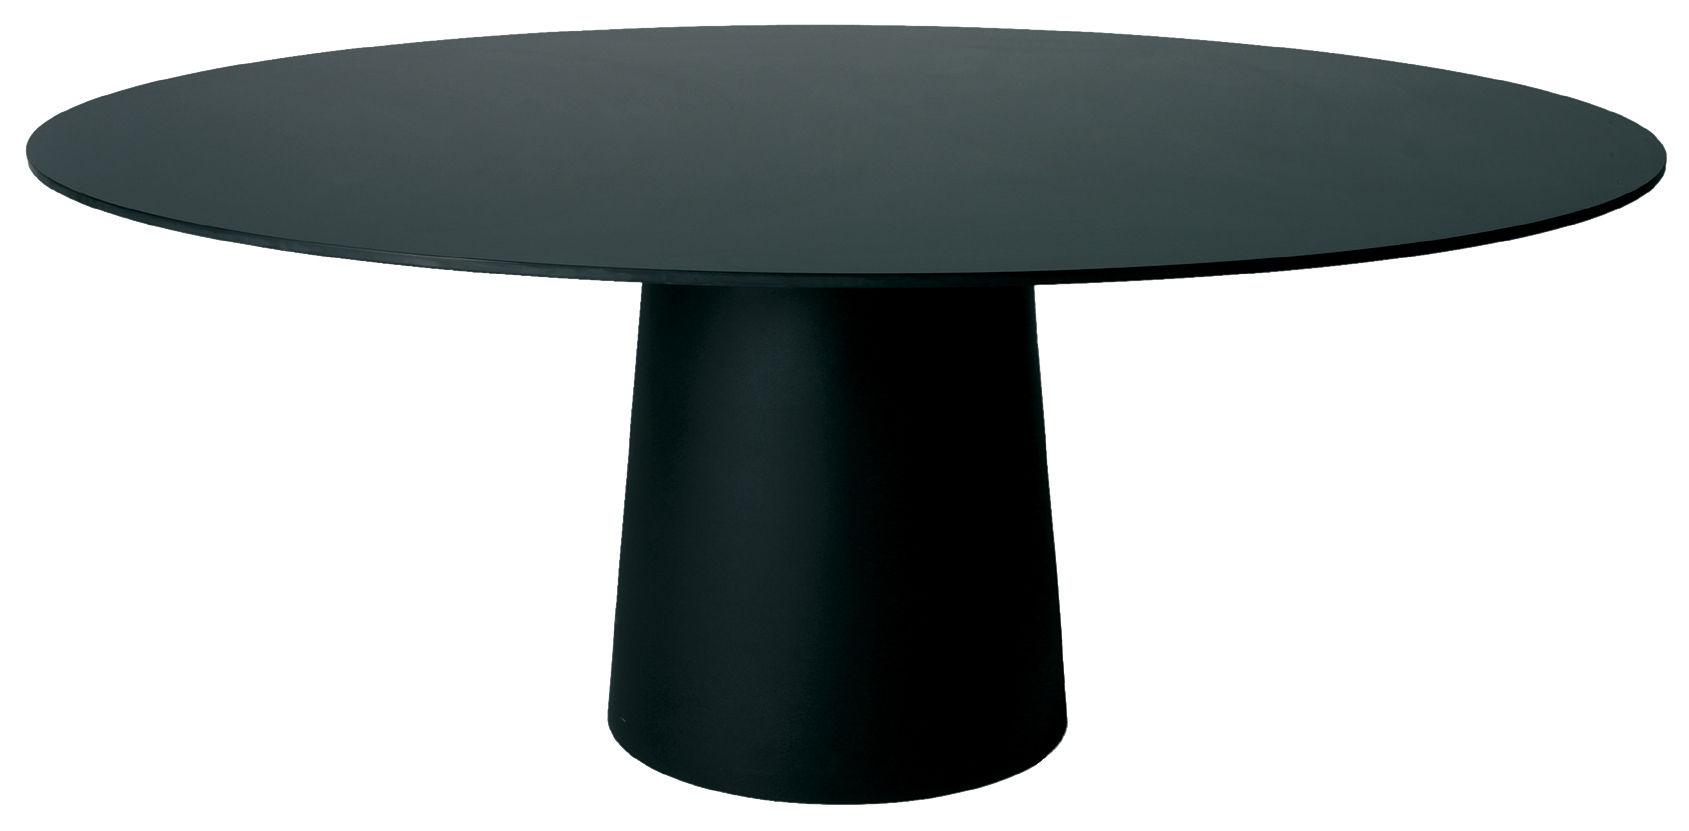 Outdoor - Tische - Container Tischtablett / Ø 140 cm - Moooi - Tischplatte schwarz - Ø 140 cm - HPL